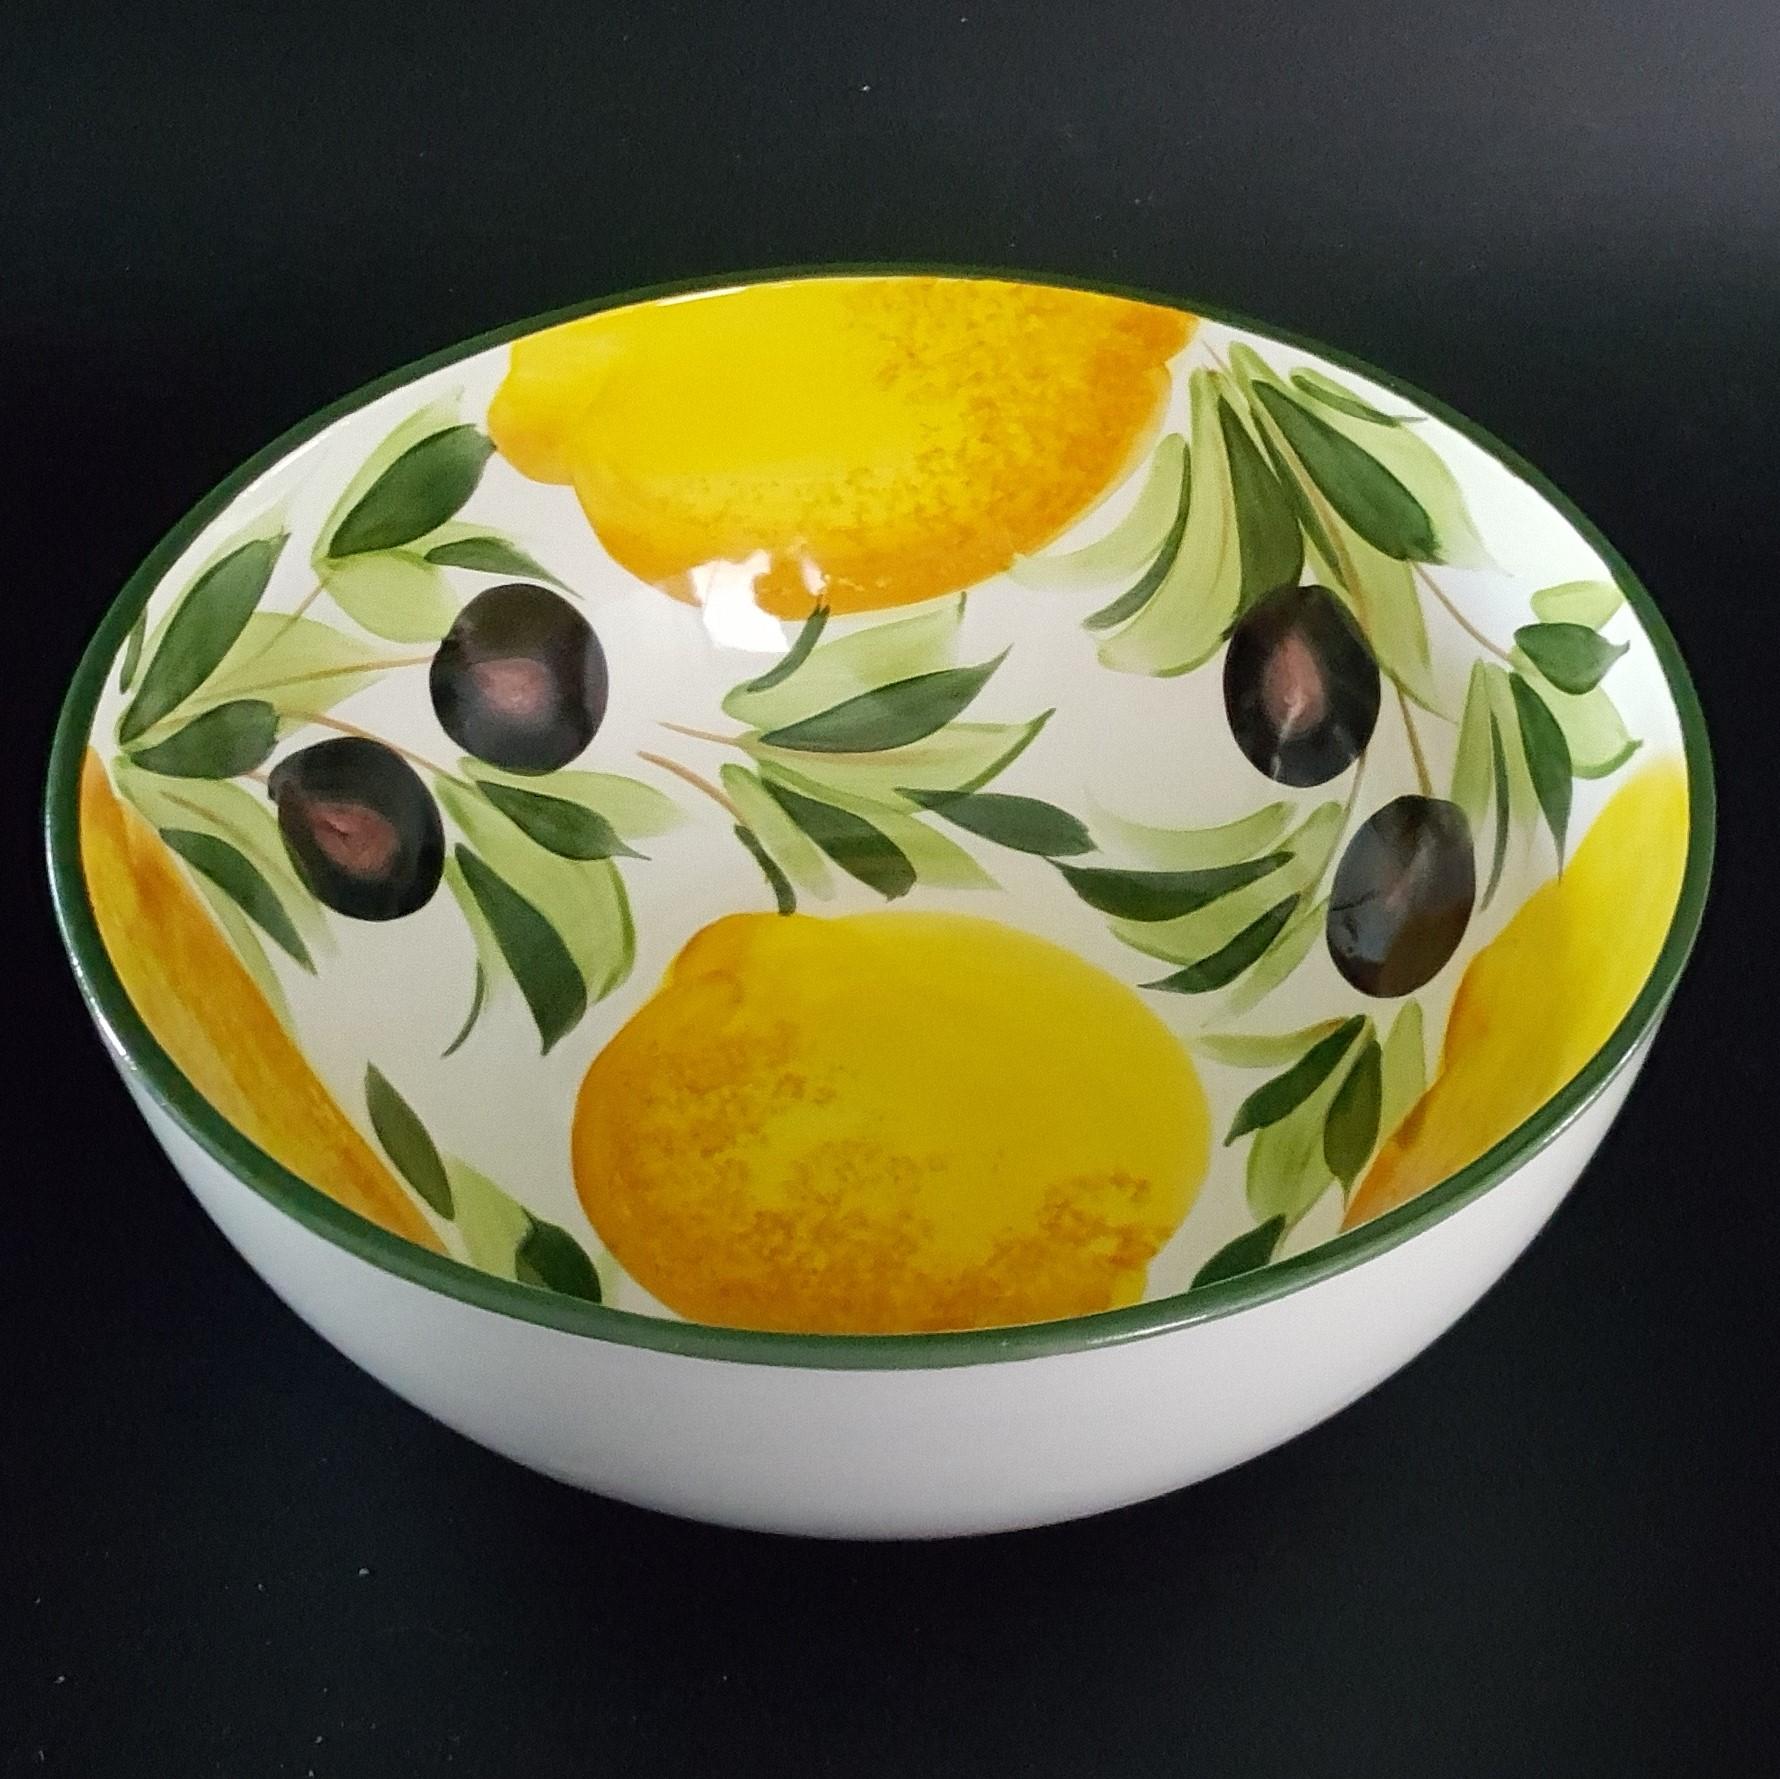 citroen 16 cm 10.95